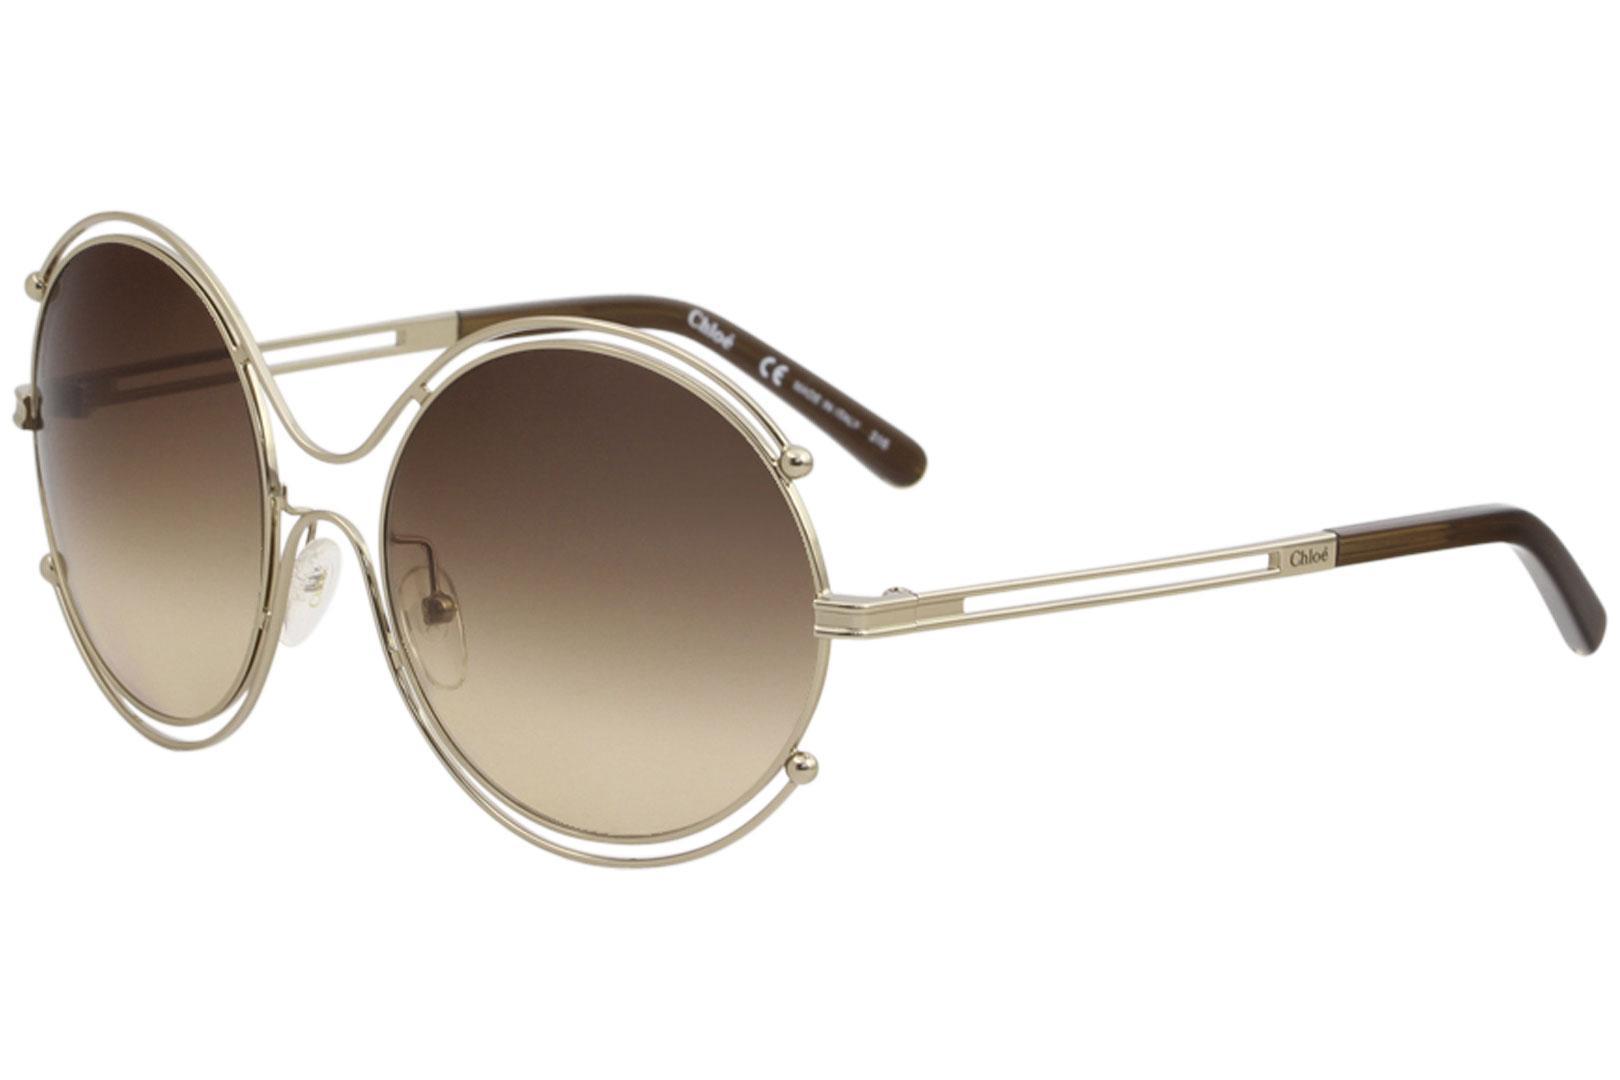 534feec00a7d Chloe Women s CE 122S CE122S 786 Rose Gold Fashion Round Sunglasses ...